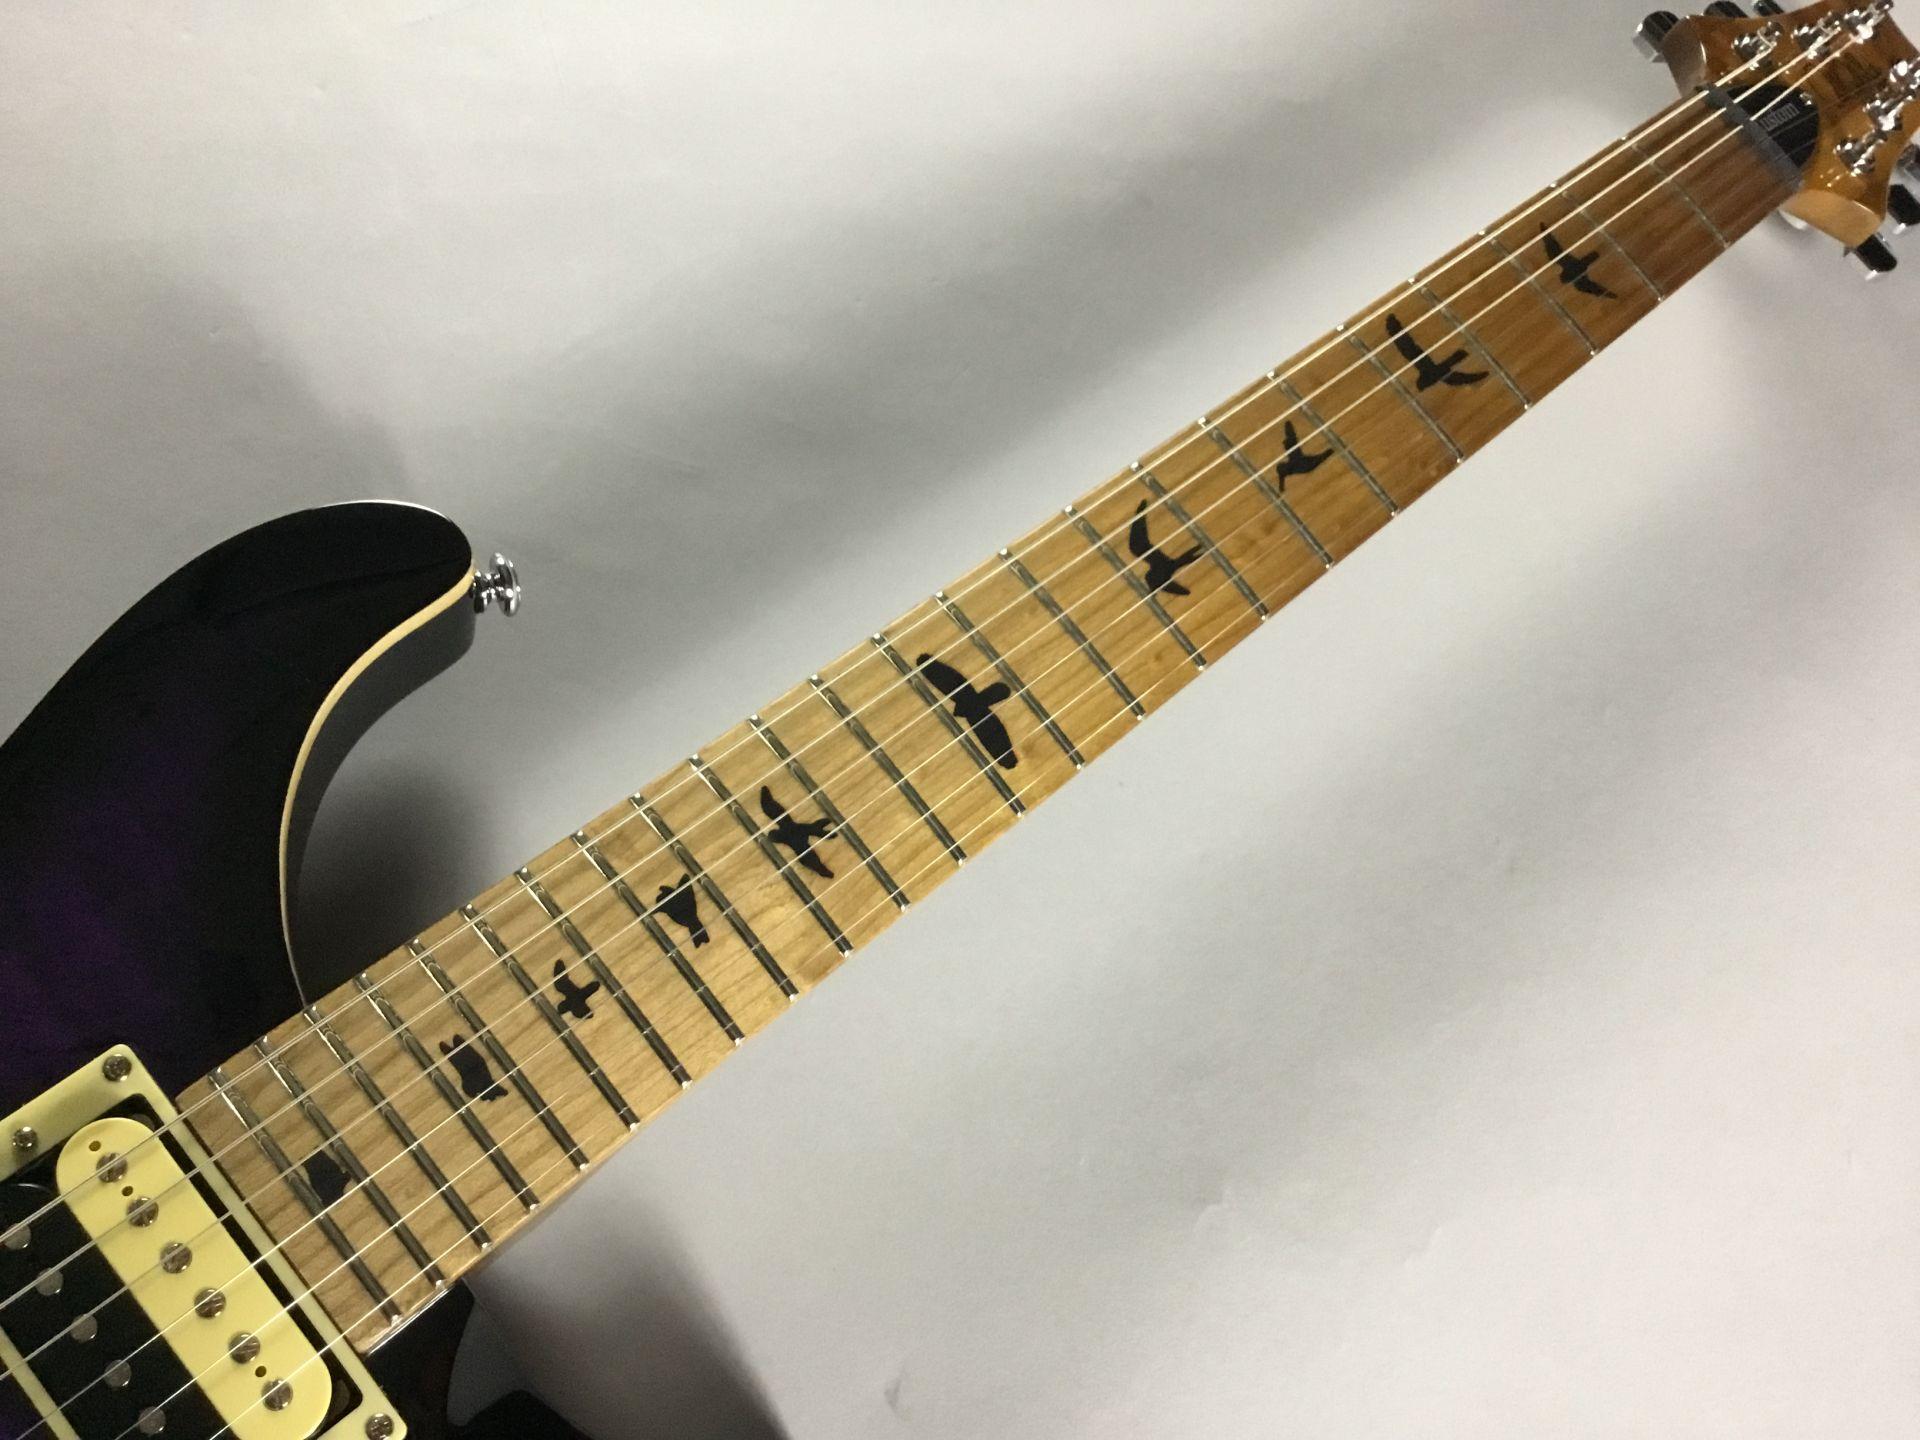 SE Custom 24 Rasted Maple【限定品】のボディバック-アップ画像